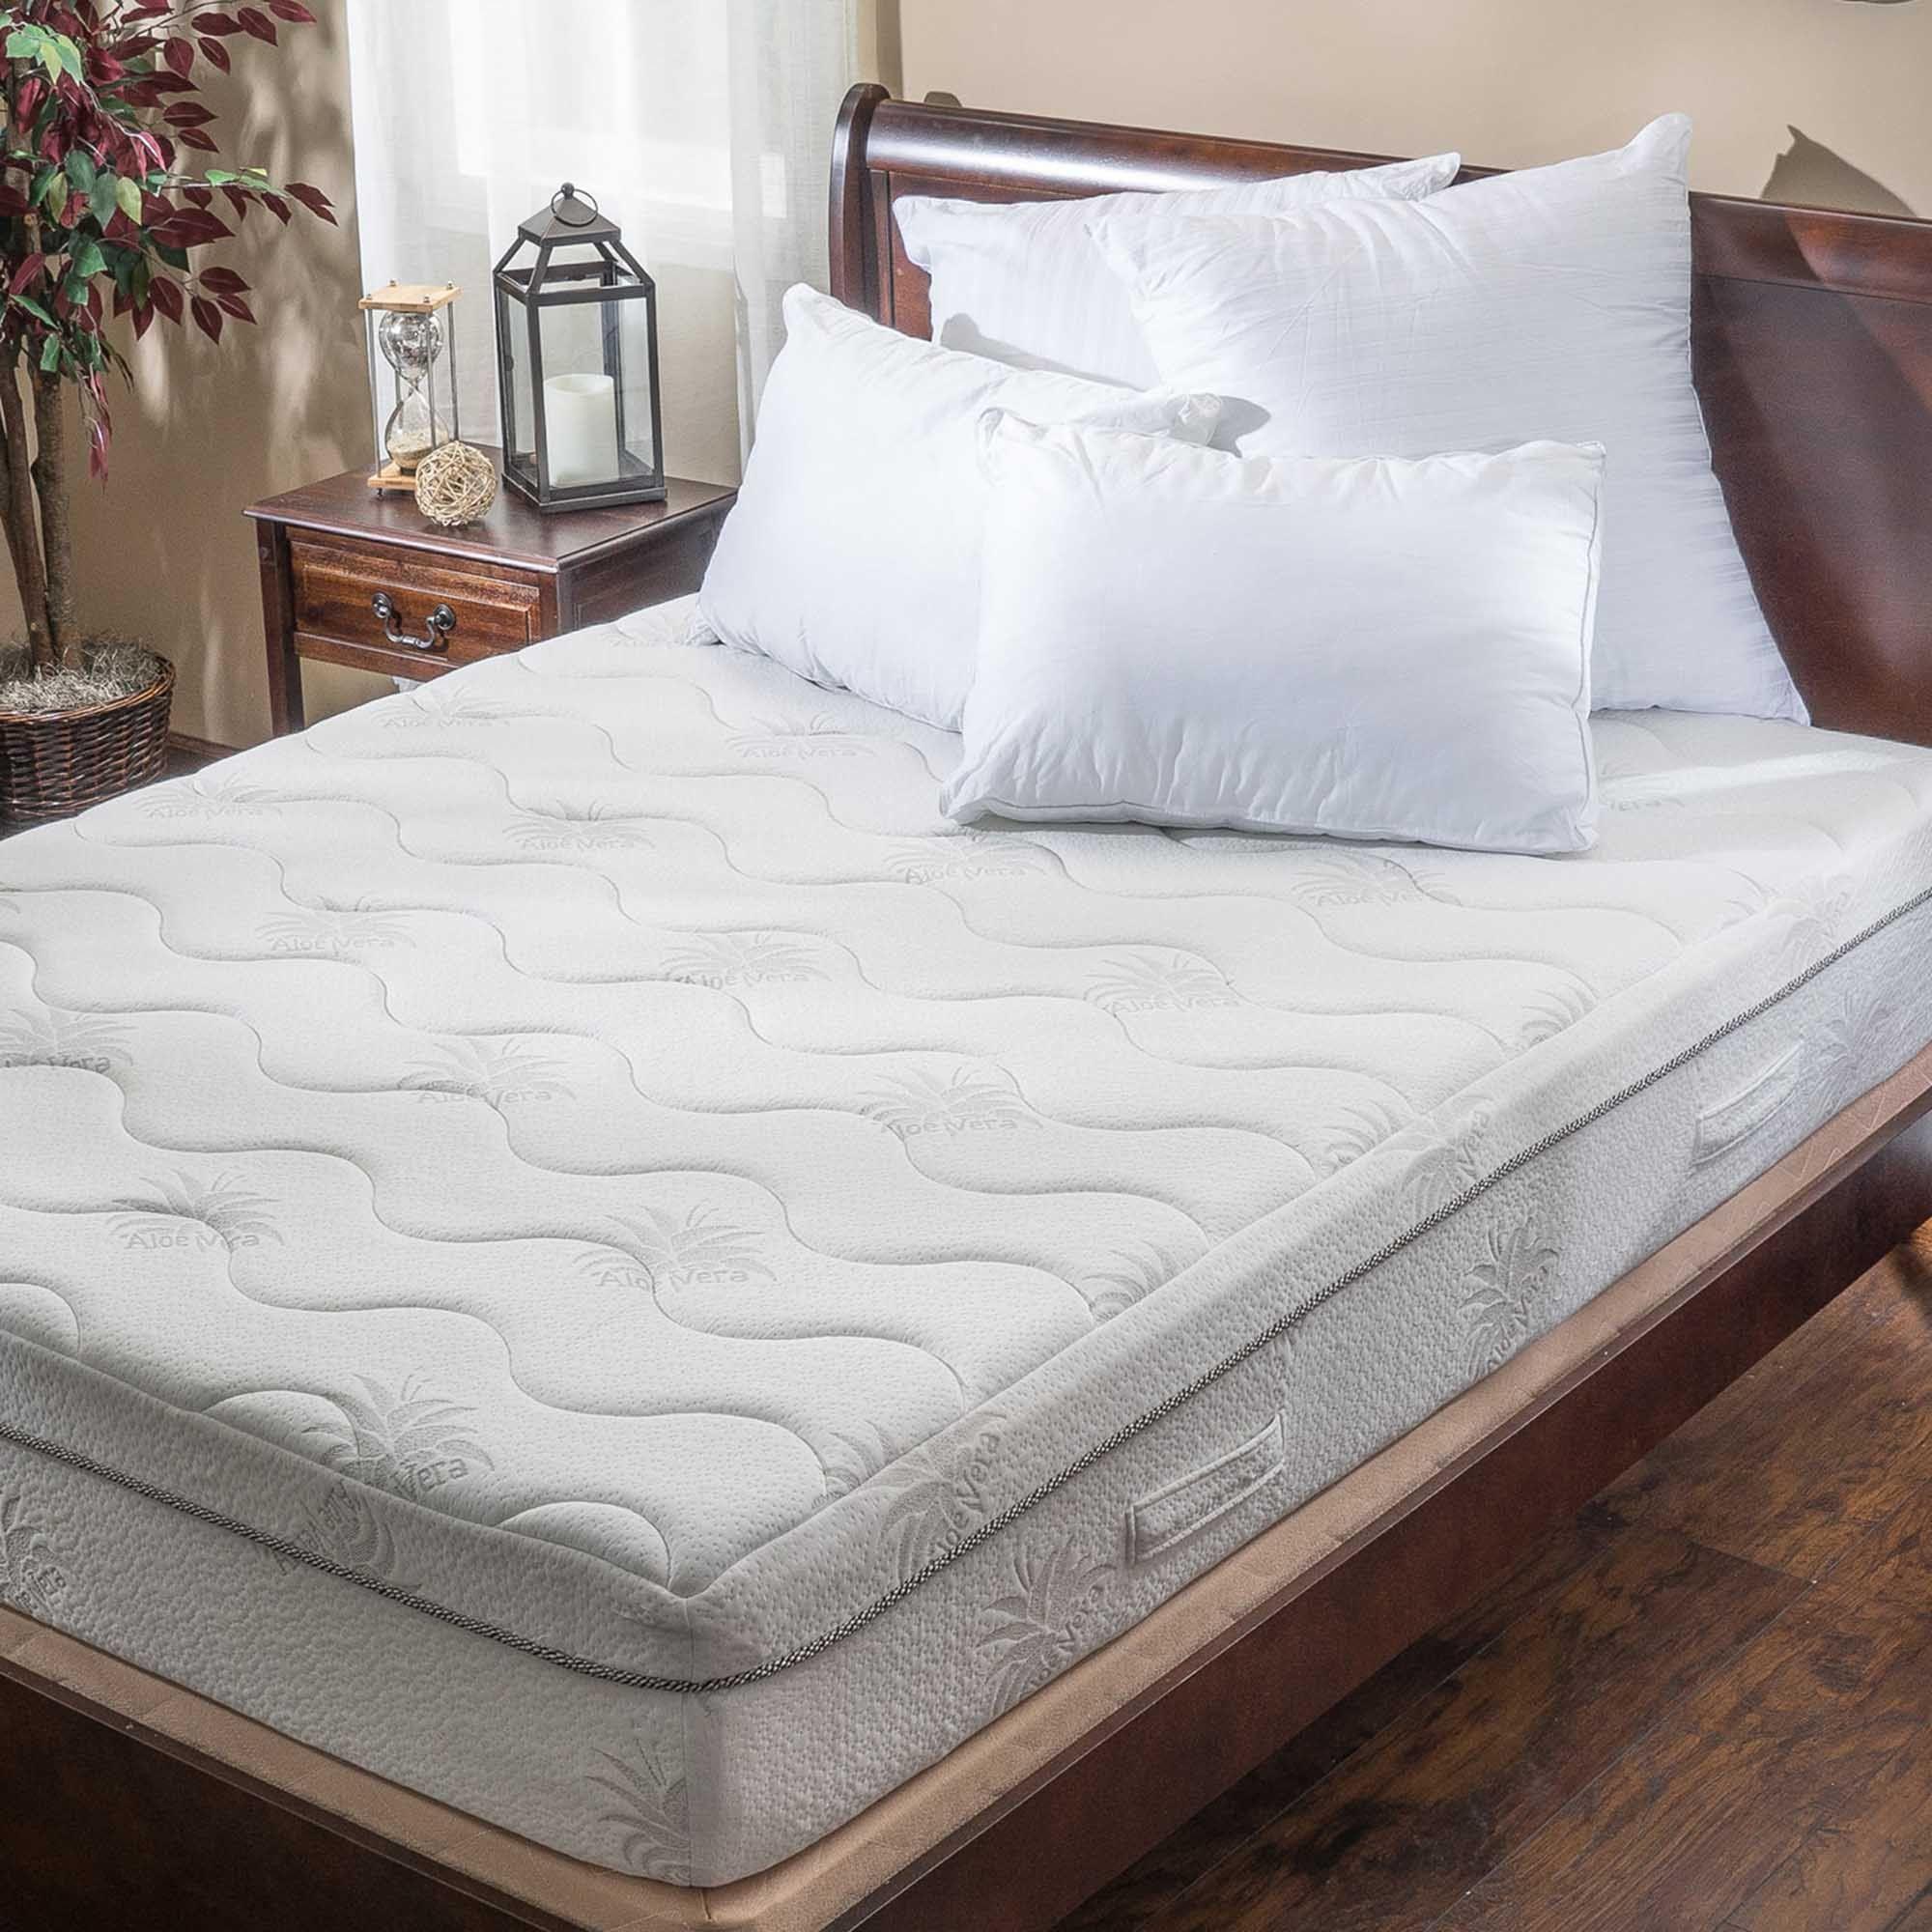 ad aloe gel memory foam 11 inch queen size smooth top mattress built